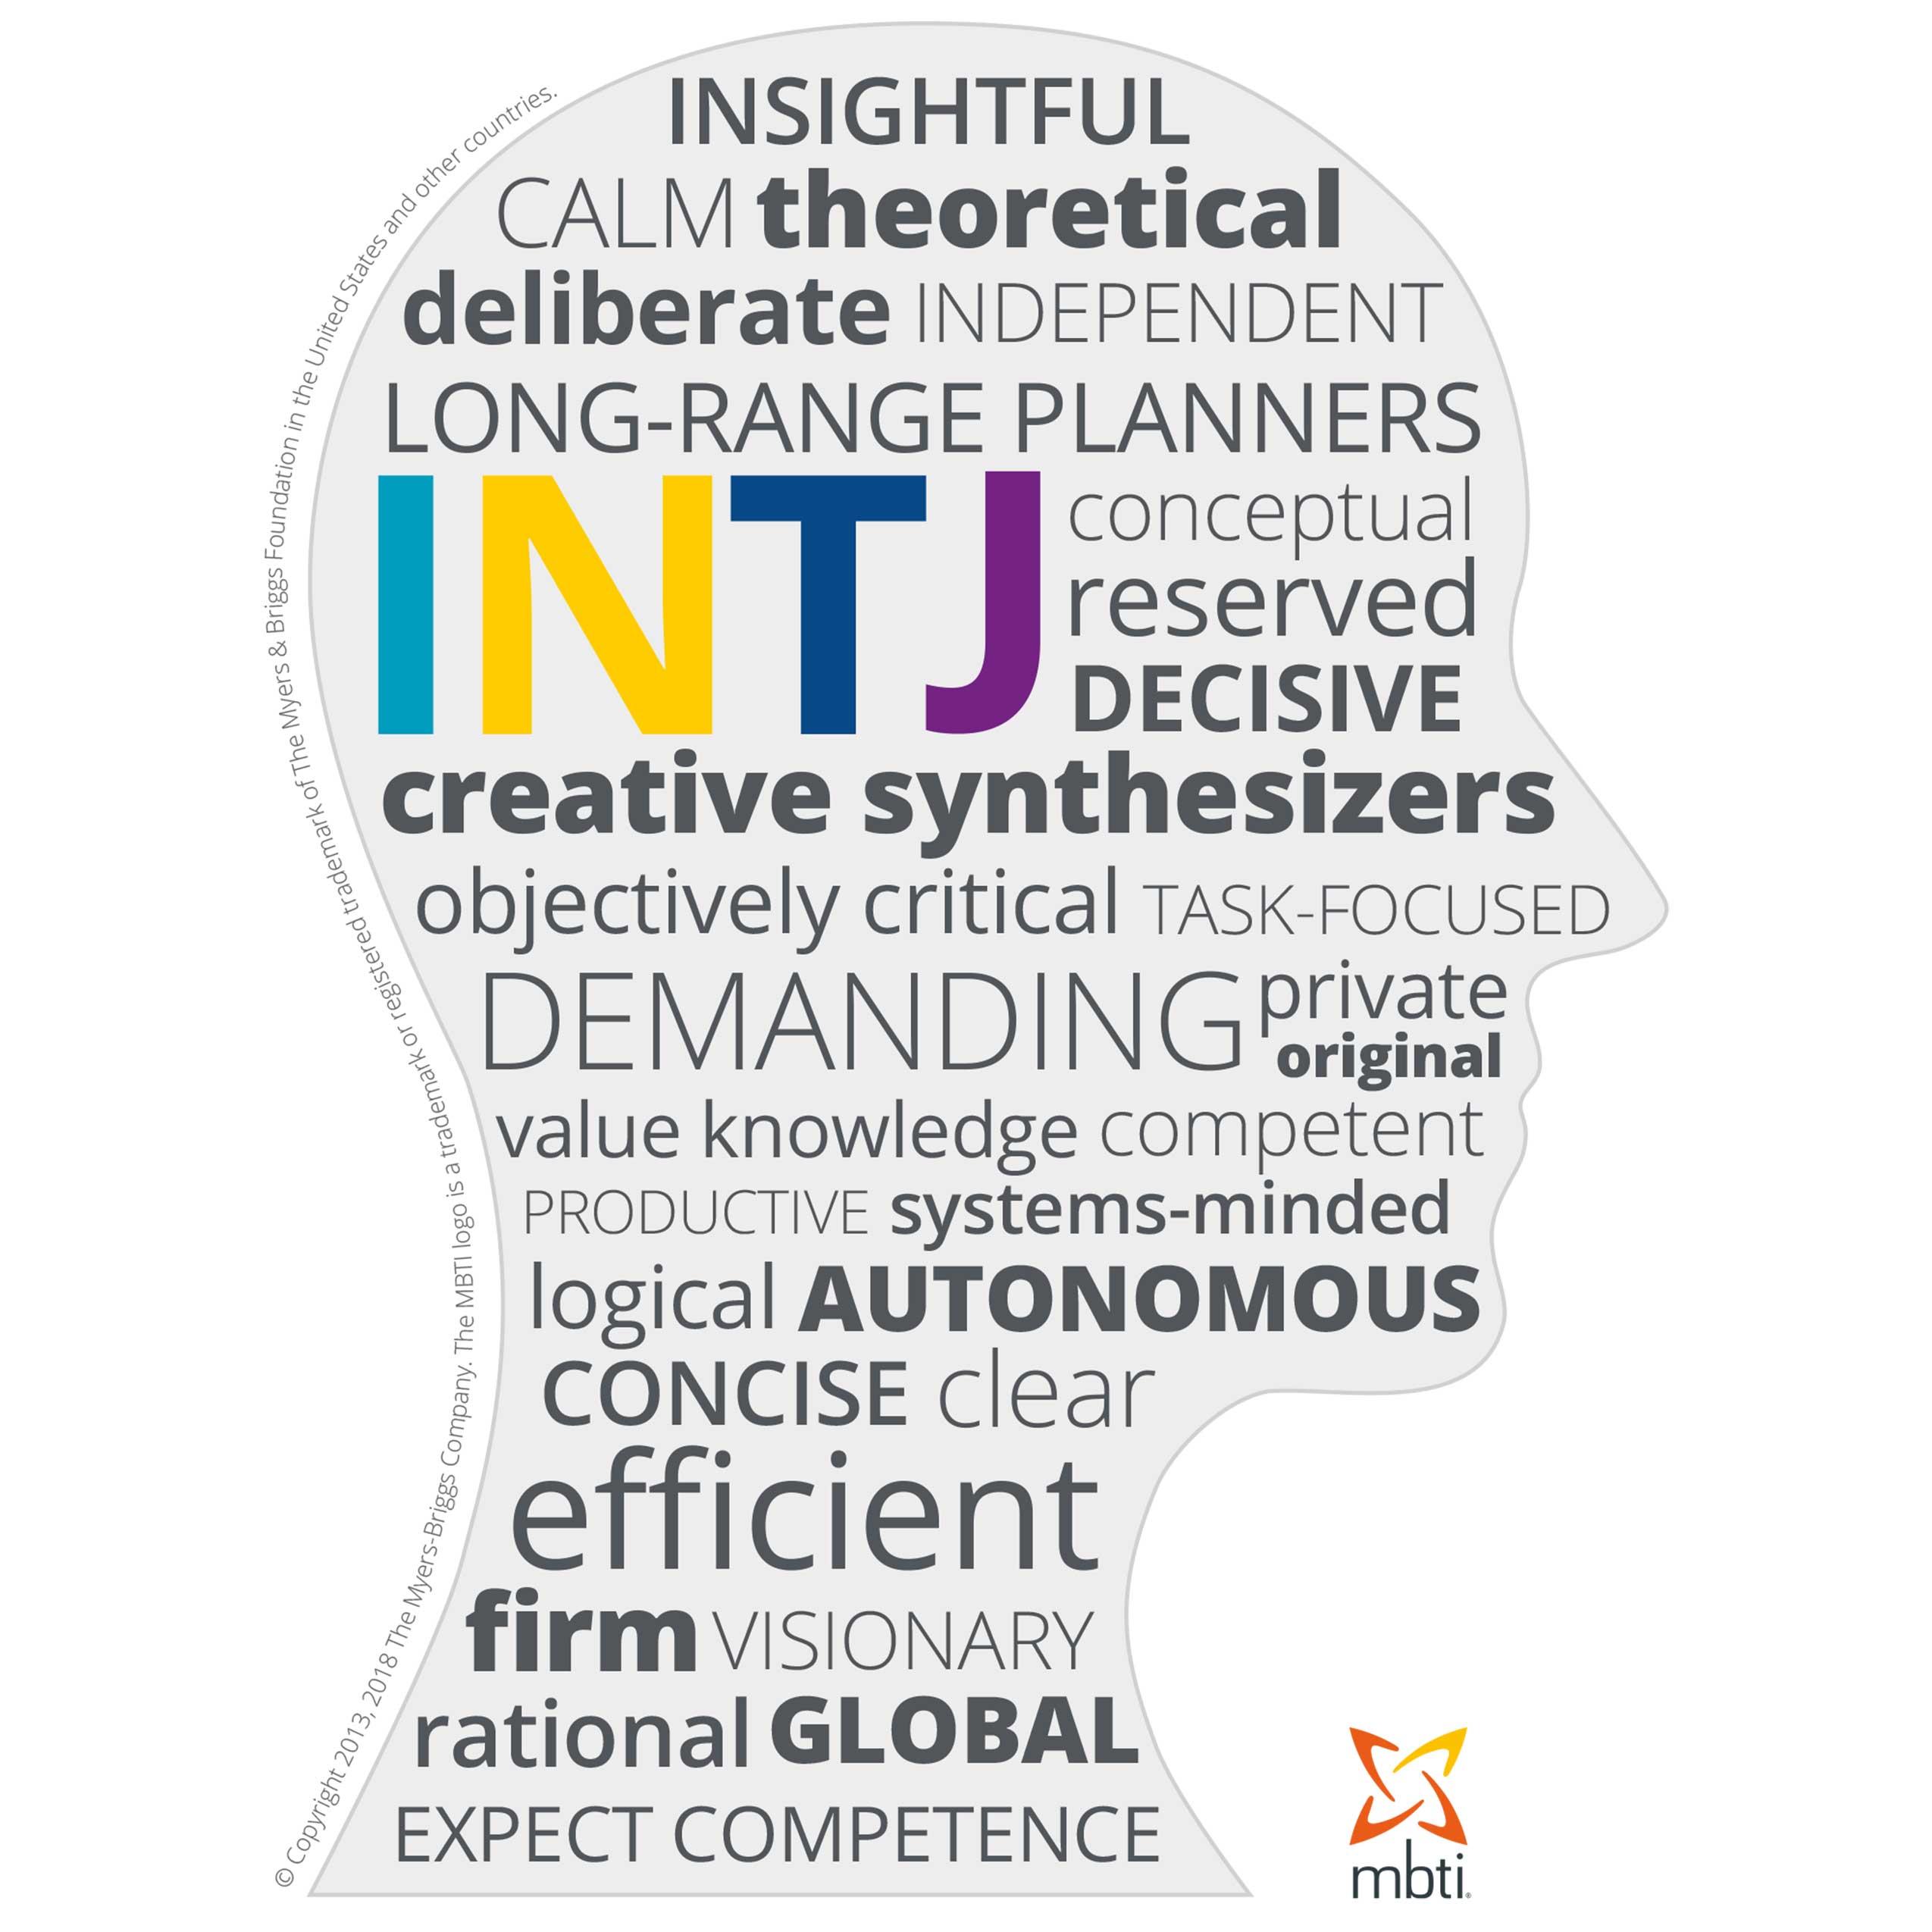 MBTI Myers-Briggs Personality Type Characteristics INTJ